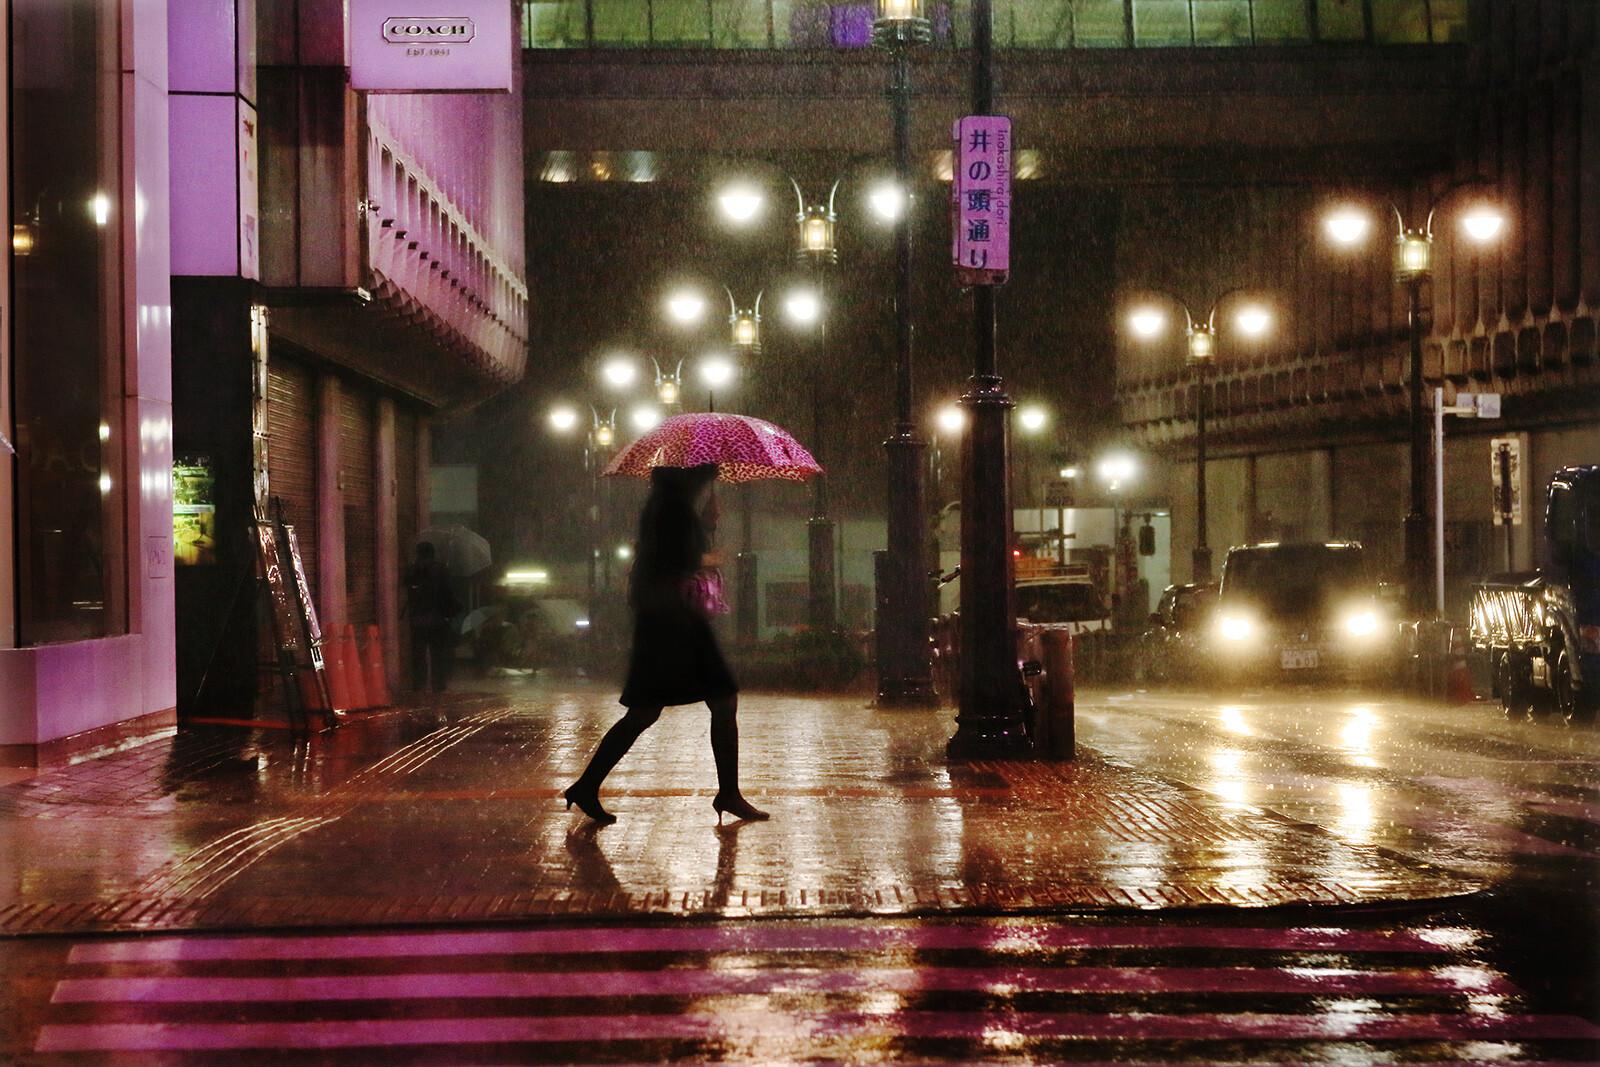 Purple in the rain - Christophe Jacrot